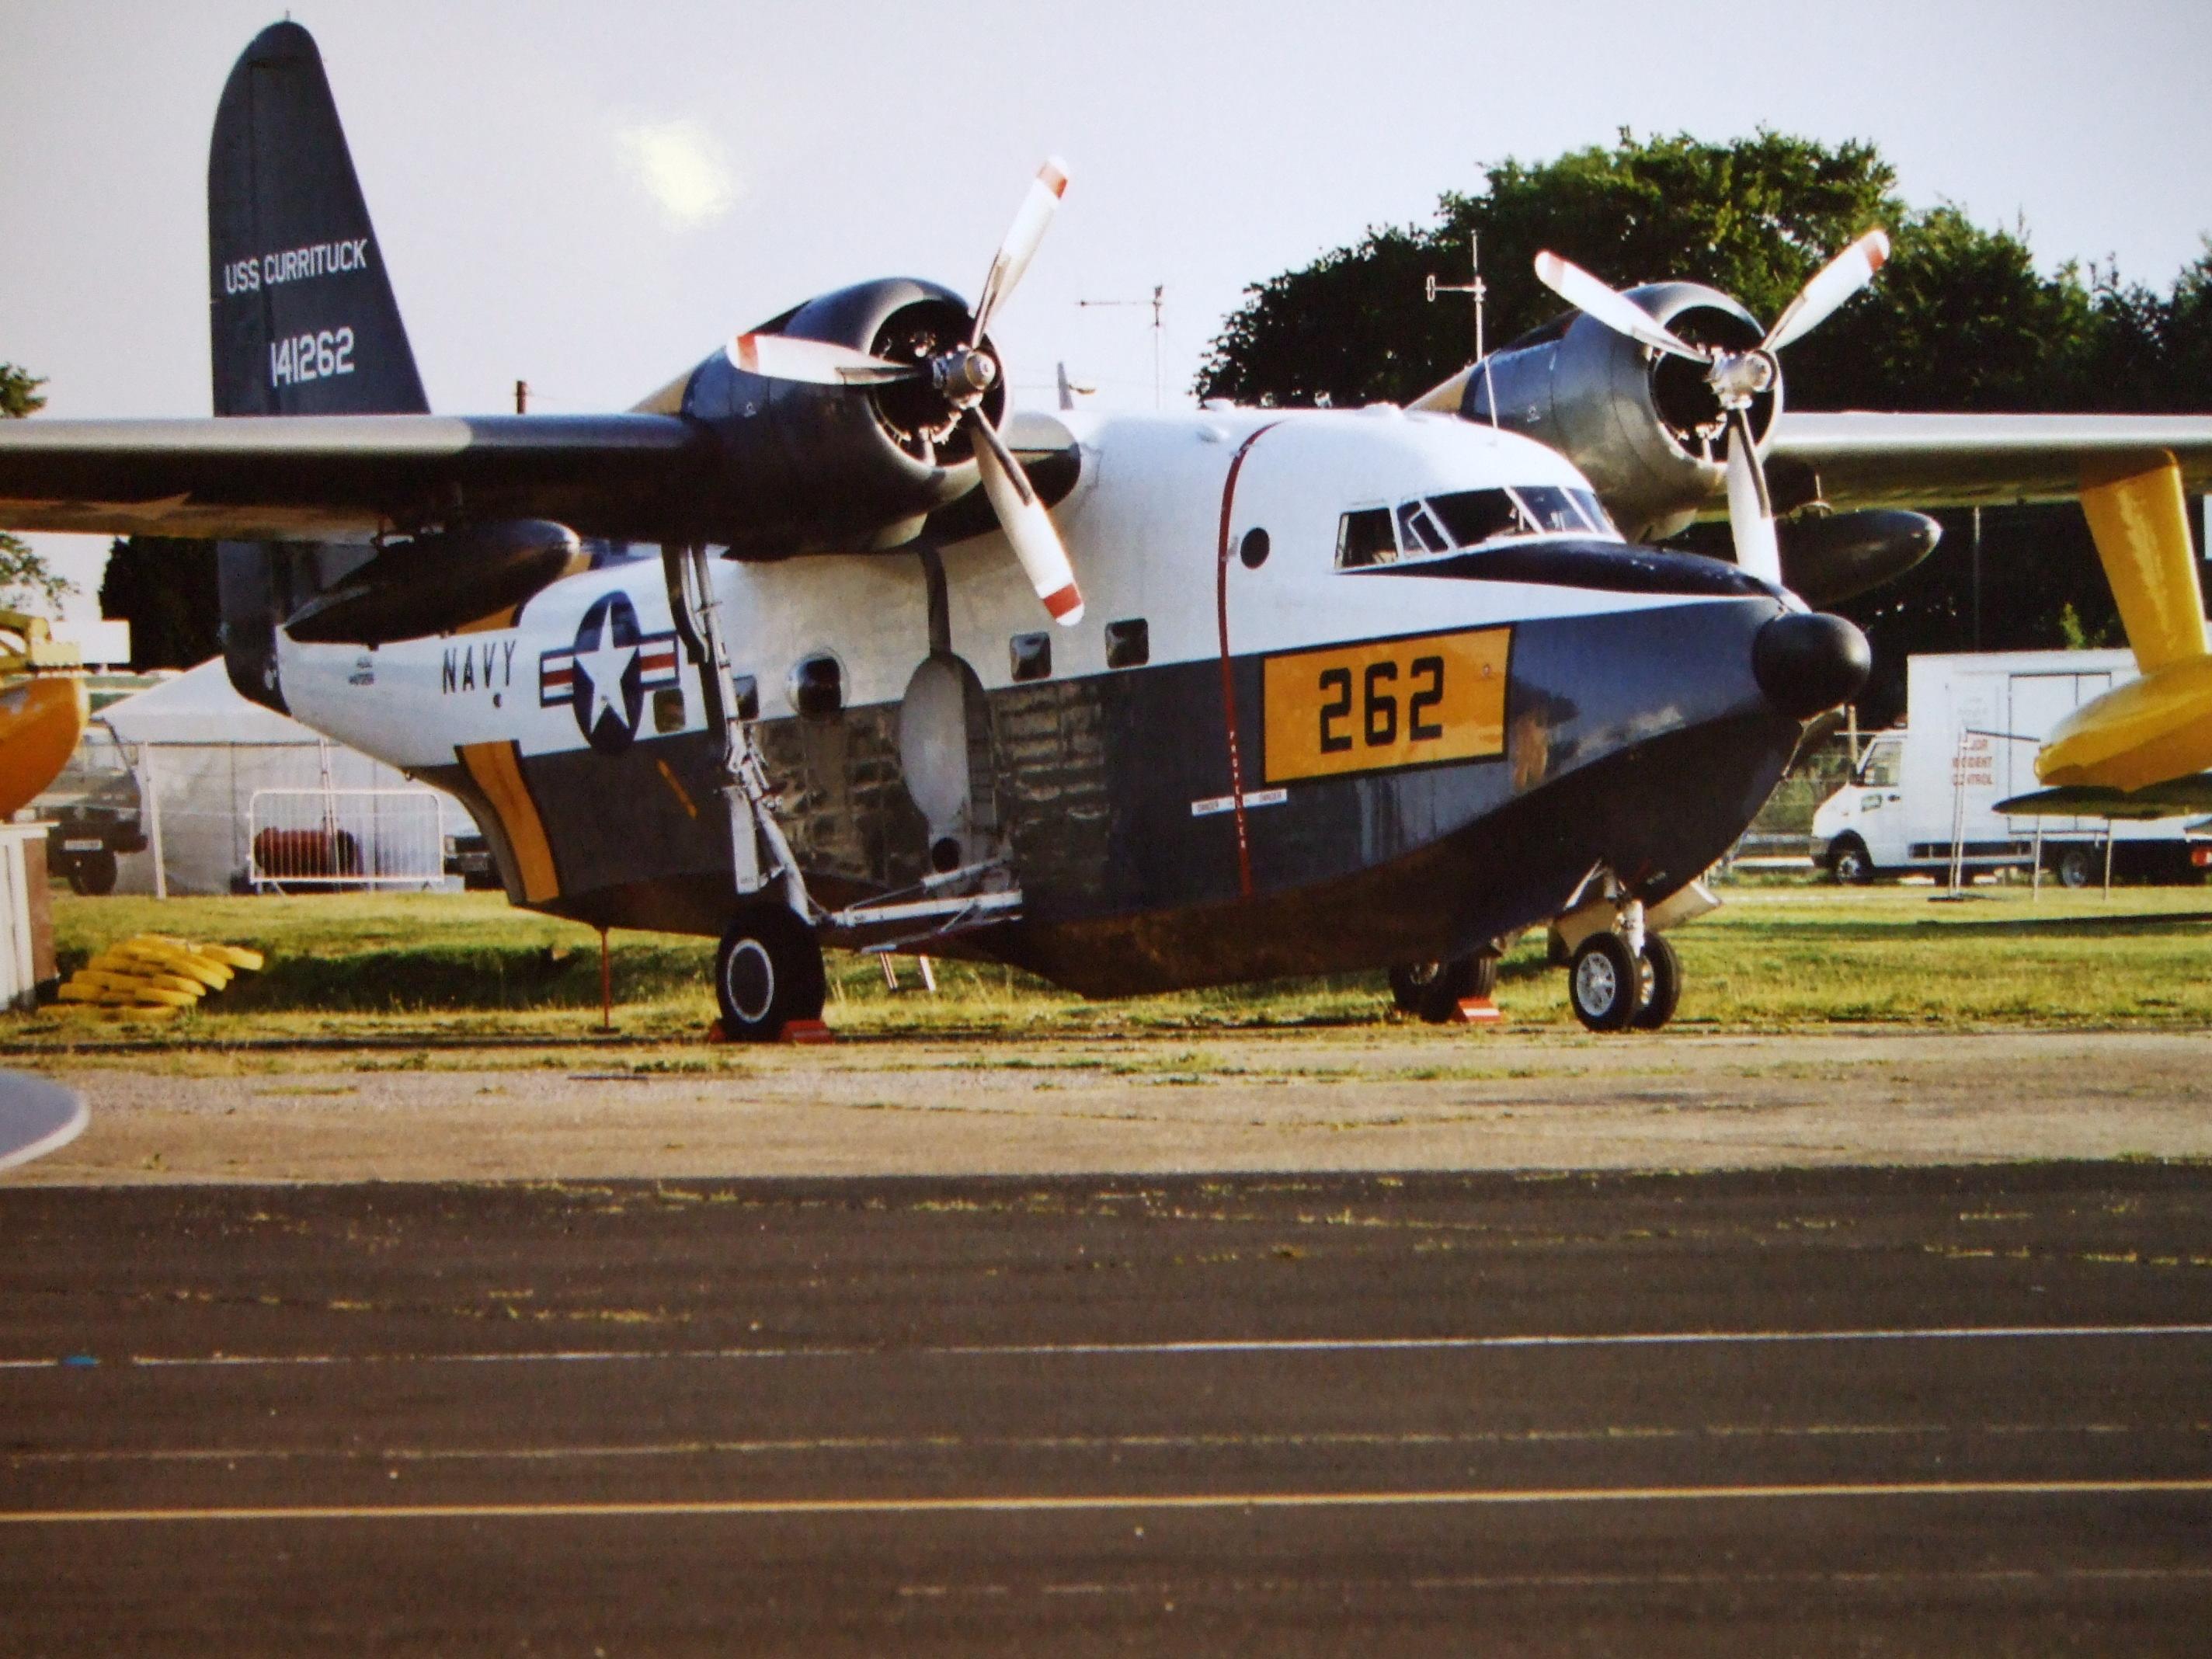 classic aircraft albatross by Sceptre63